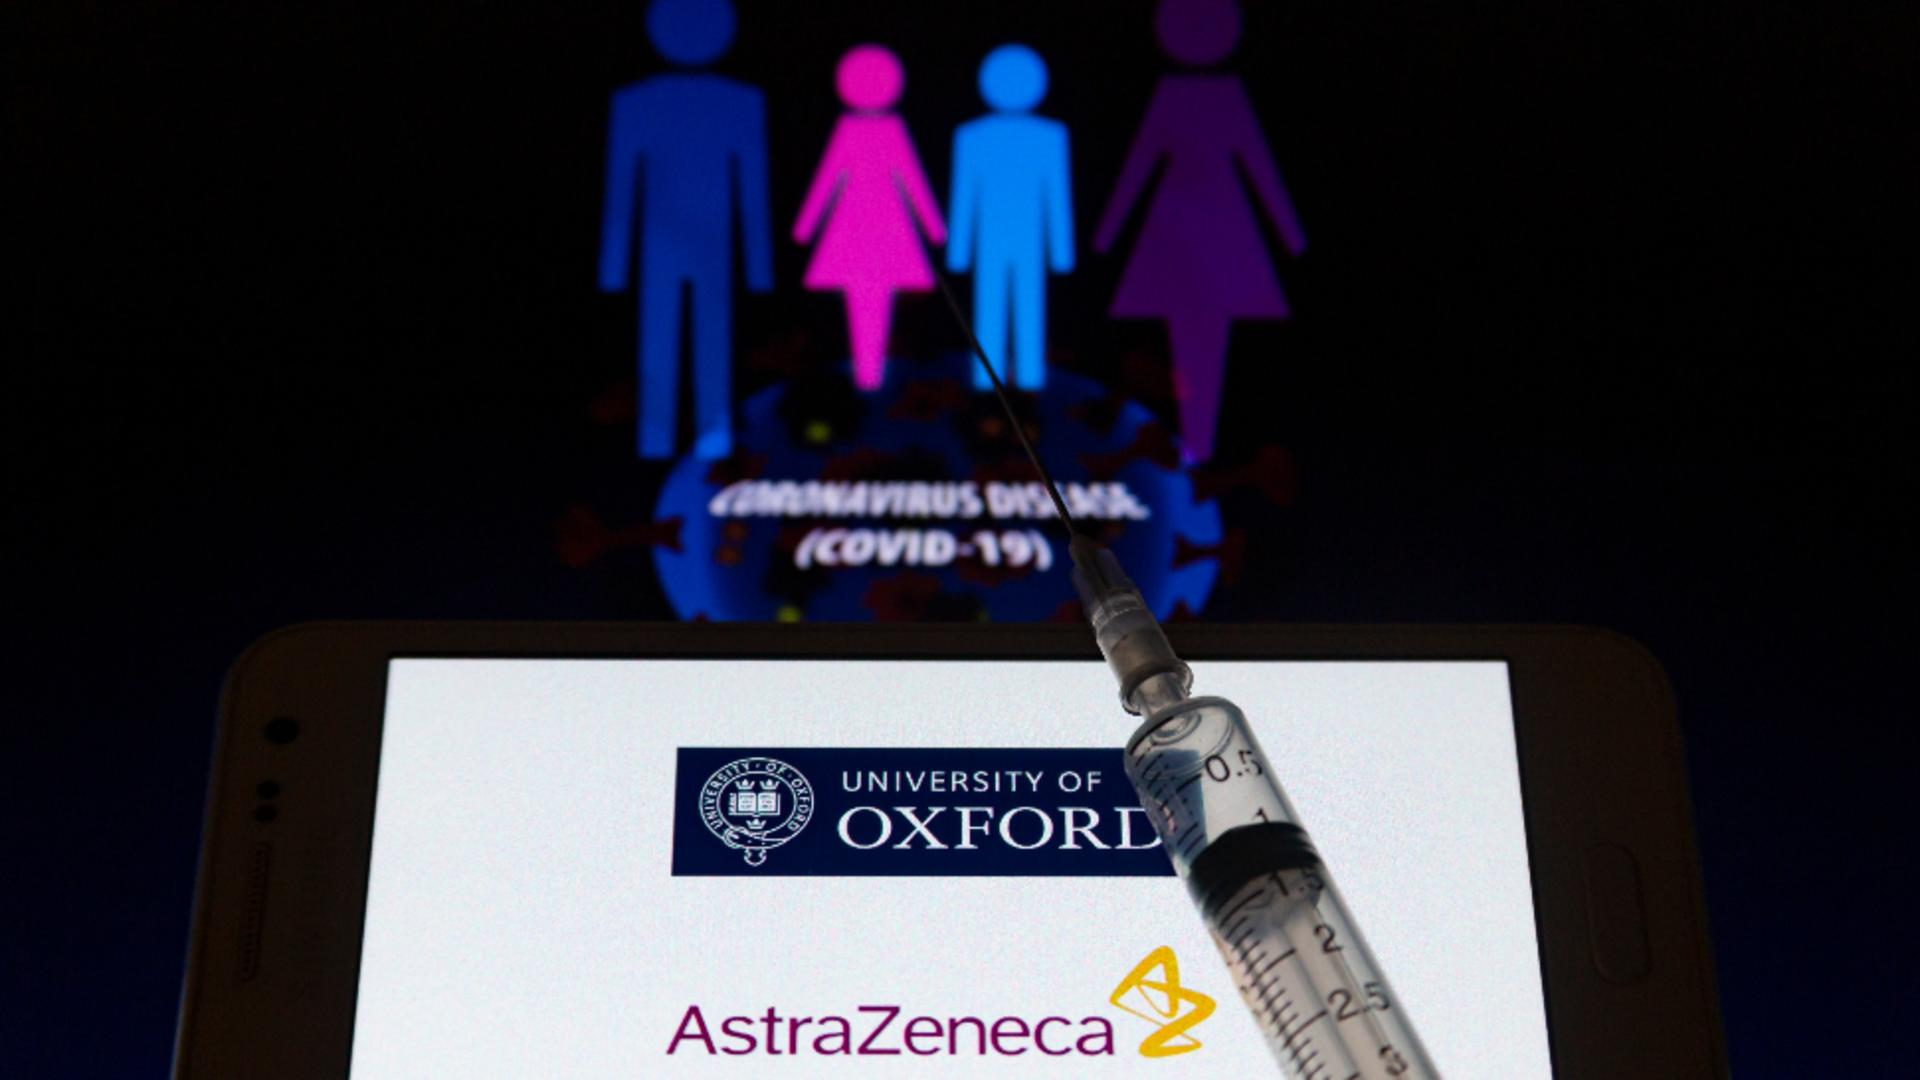 Vaccin AstraZeneca împotriva COVID-19 Foto: ProfiMedia